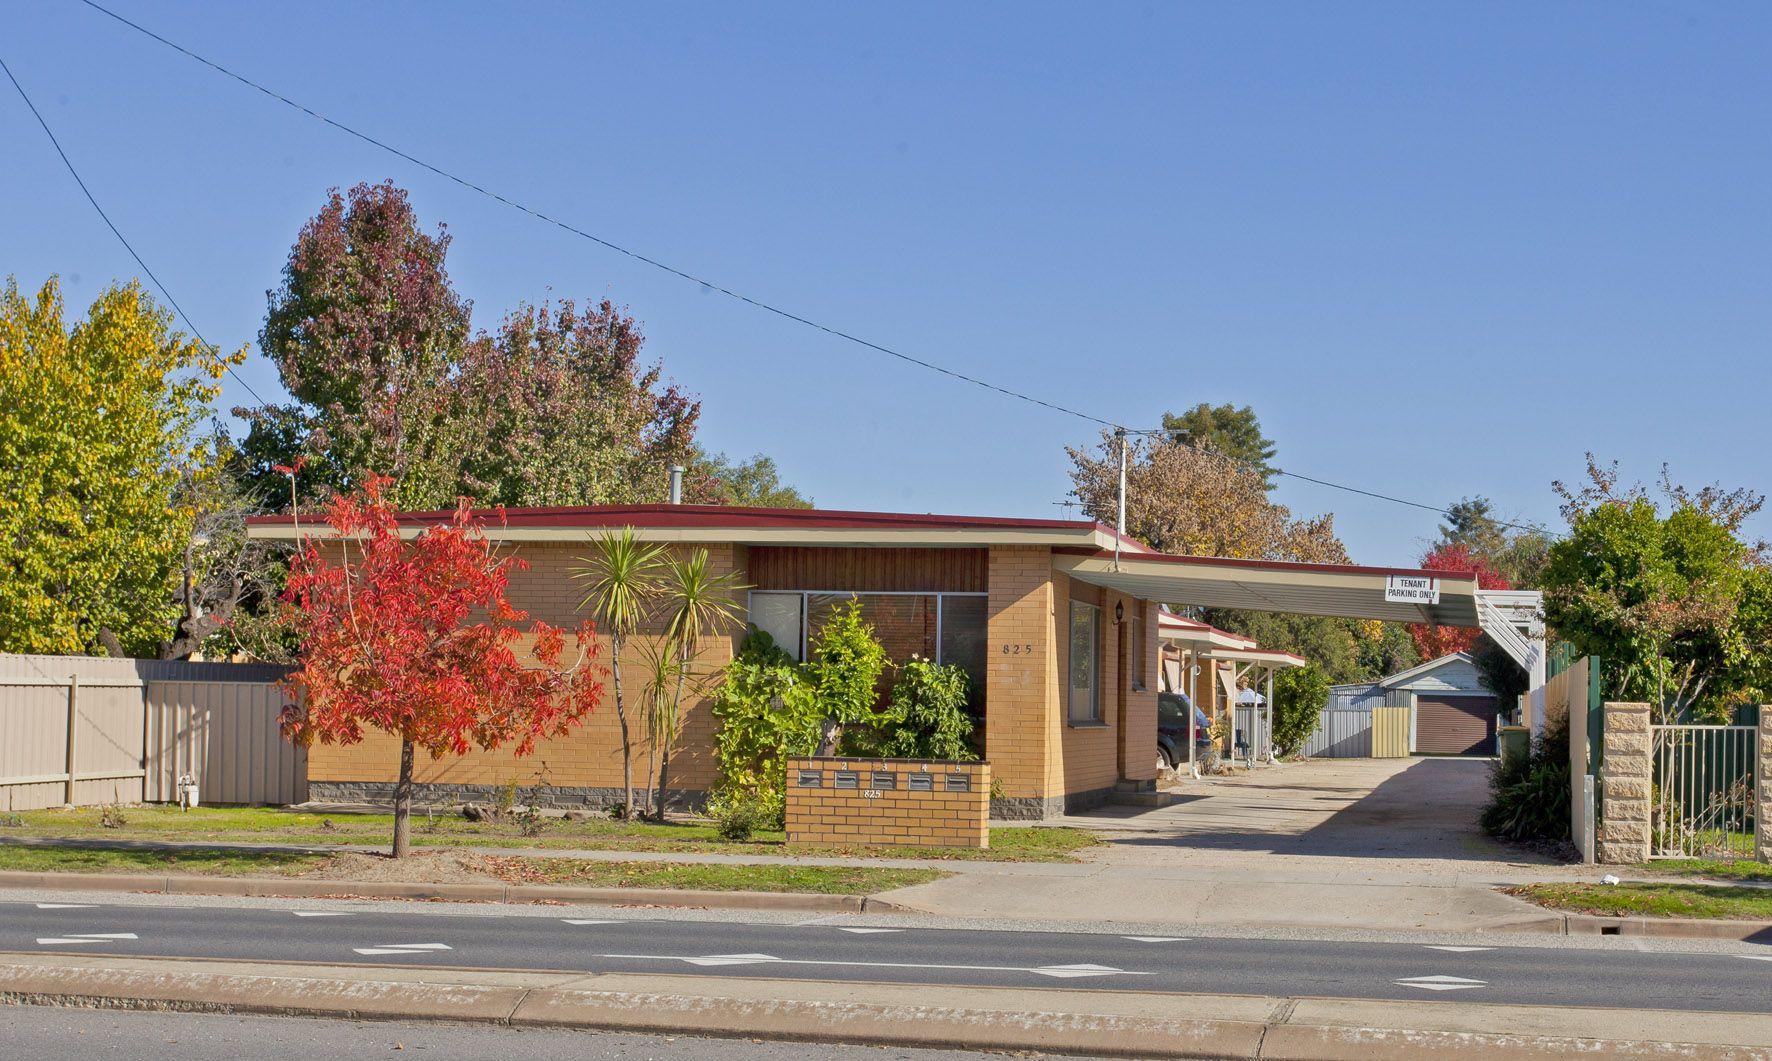 2/825 Mate Street, Albury NSW 2640, Image 0